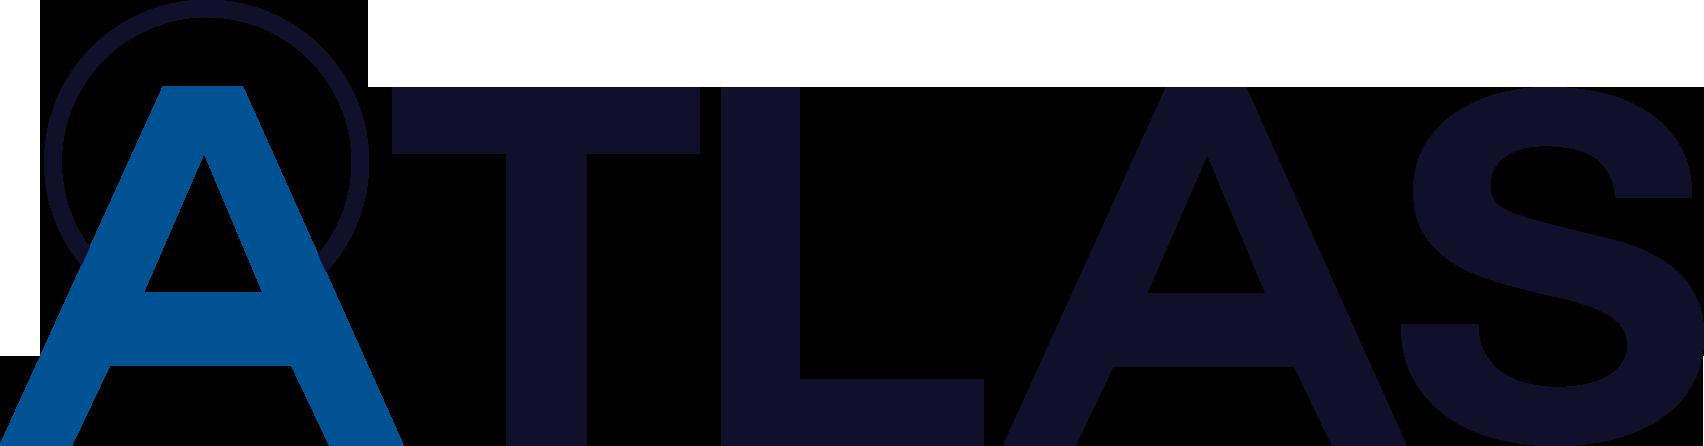 Atlas ATS